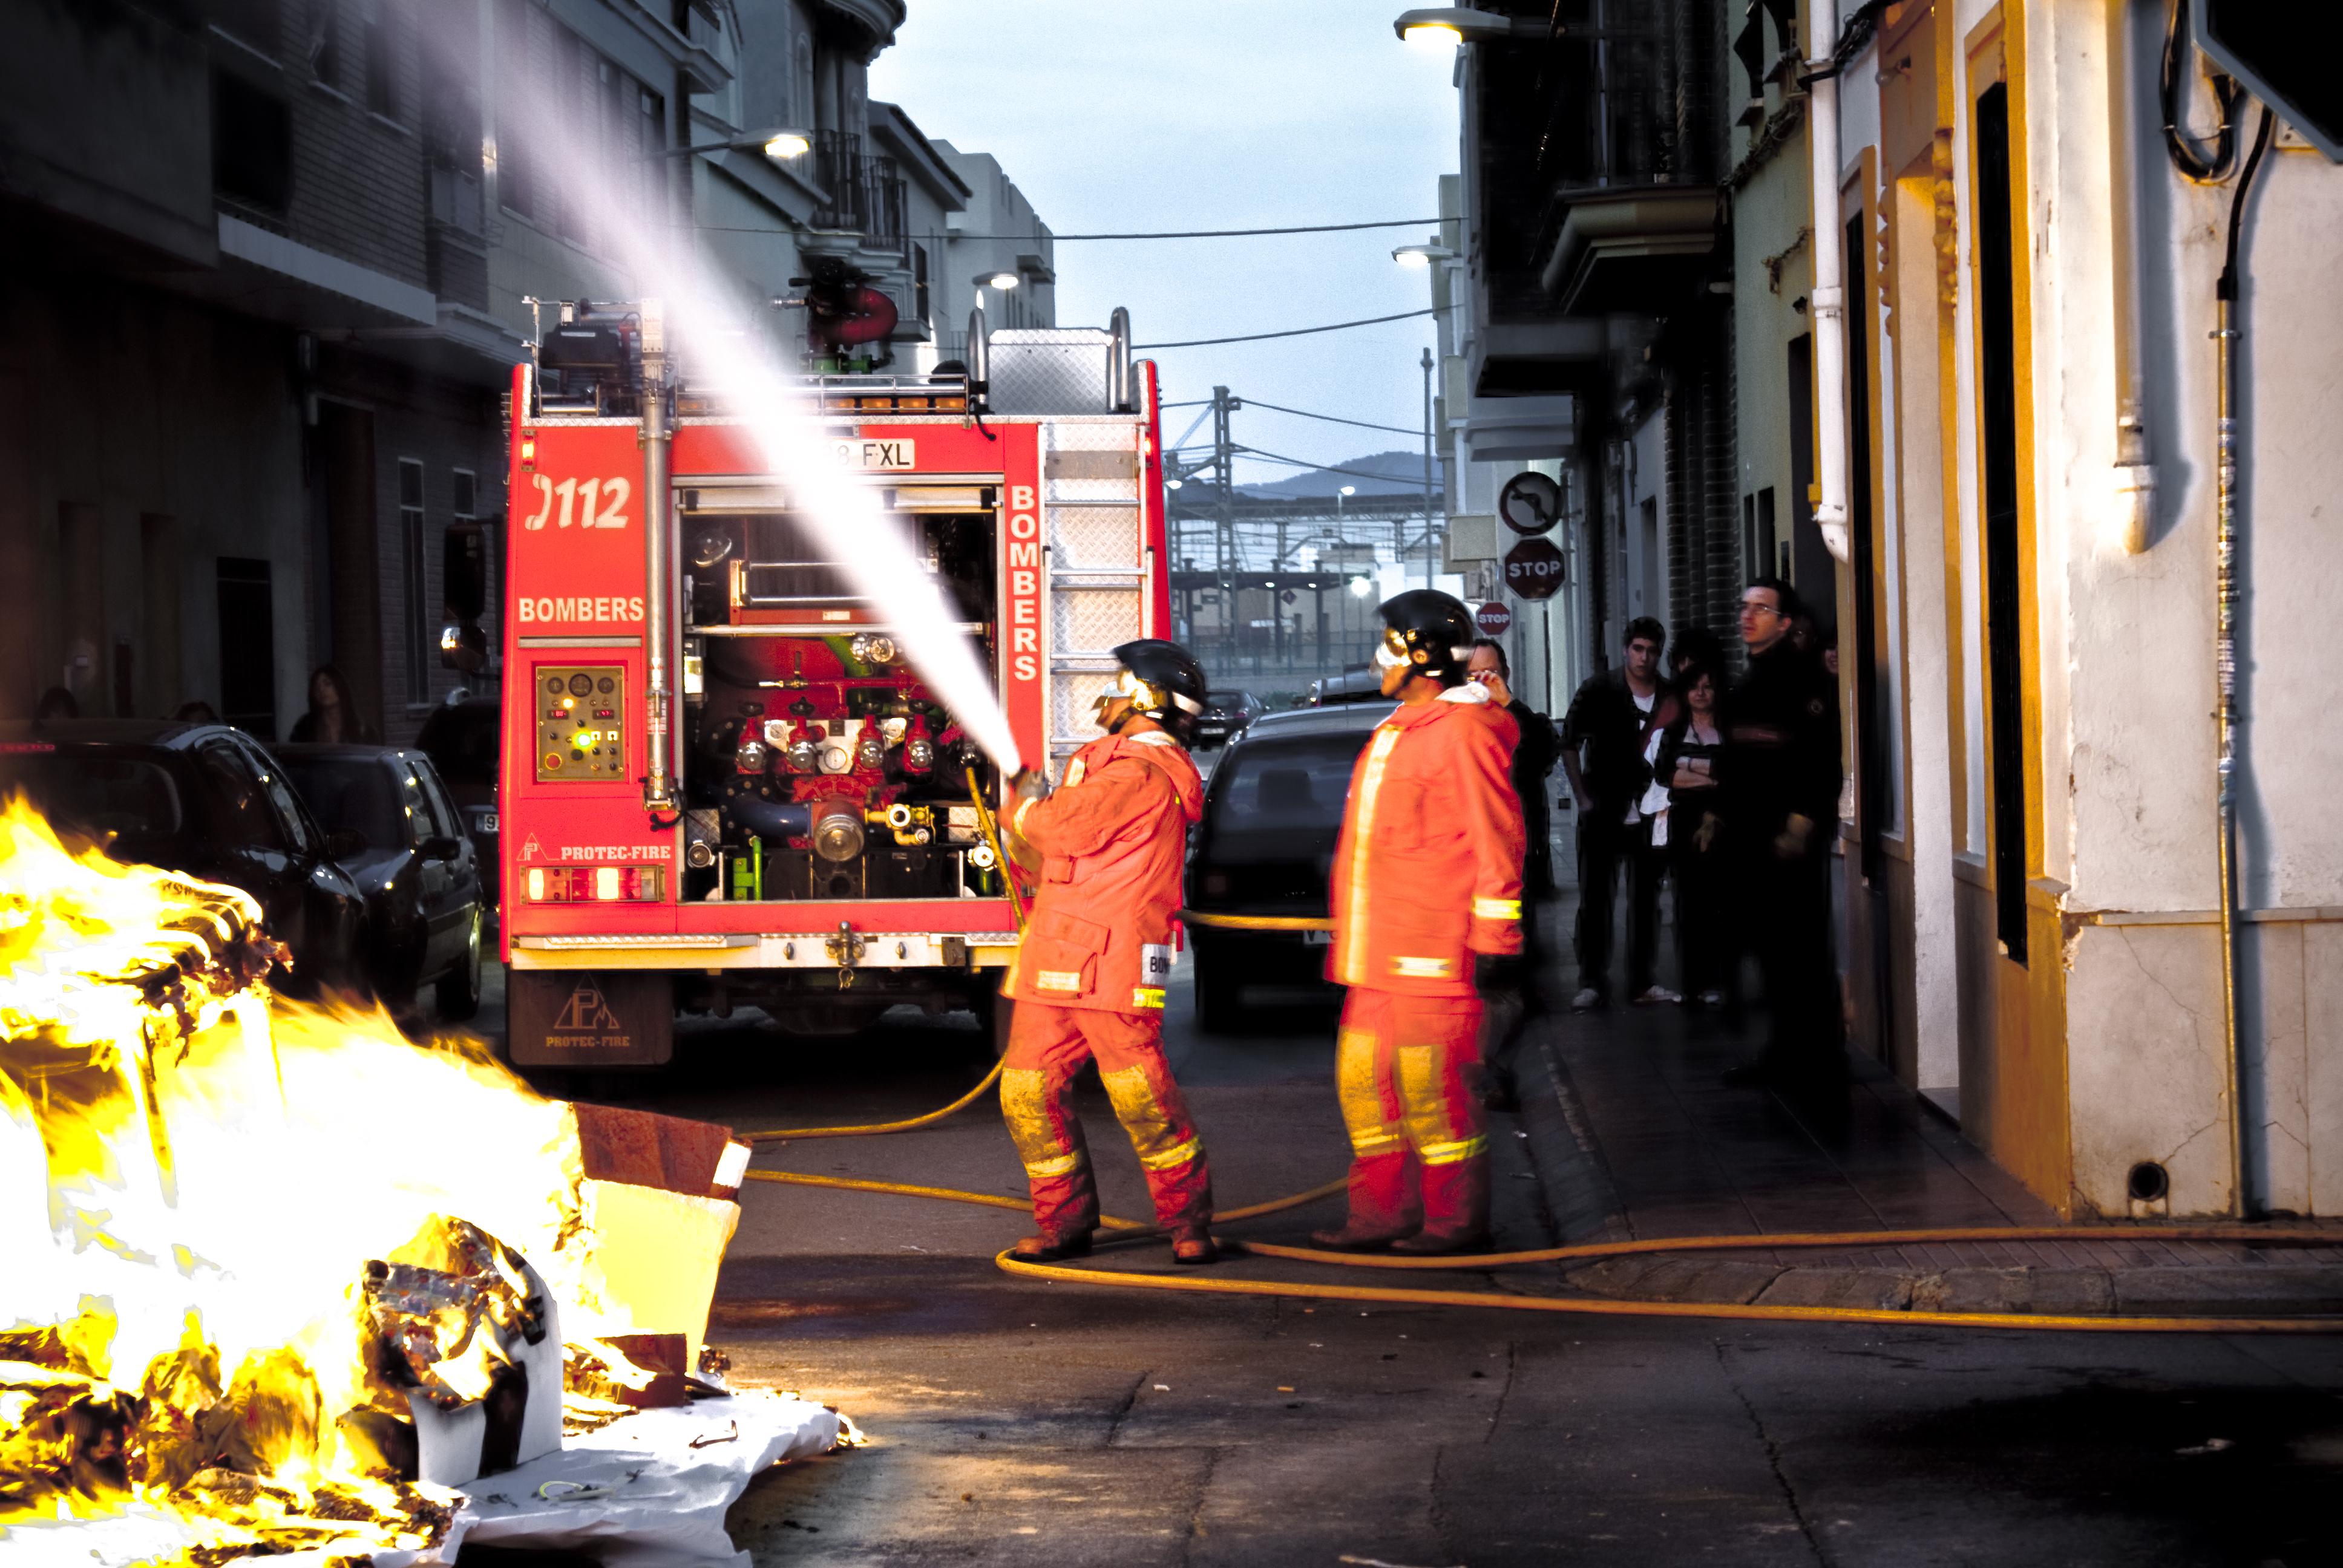 foto bombero cl: